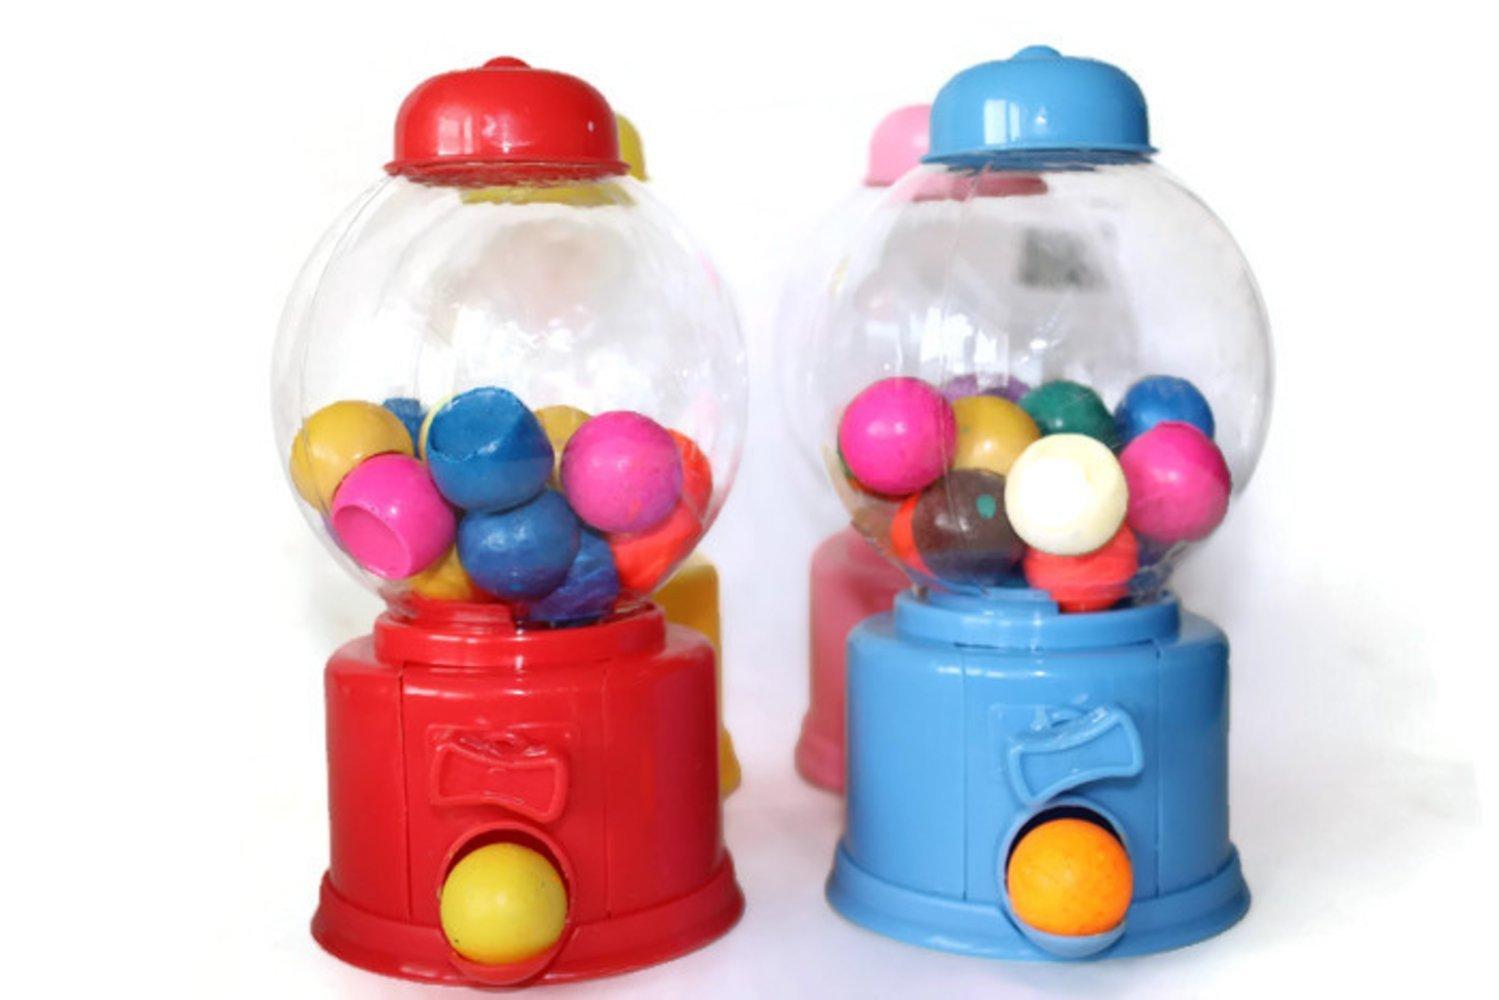 SOAP gumball machine, soap for kids, gumball machine, fun soap